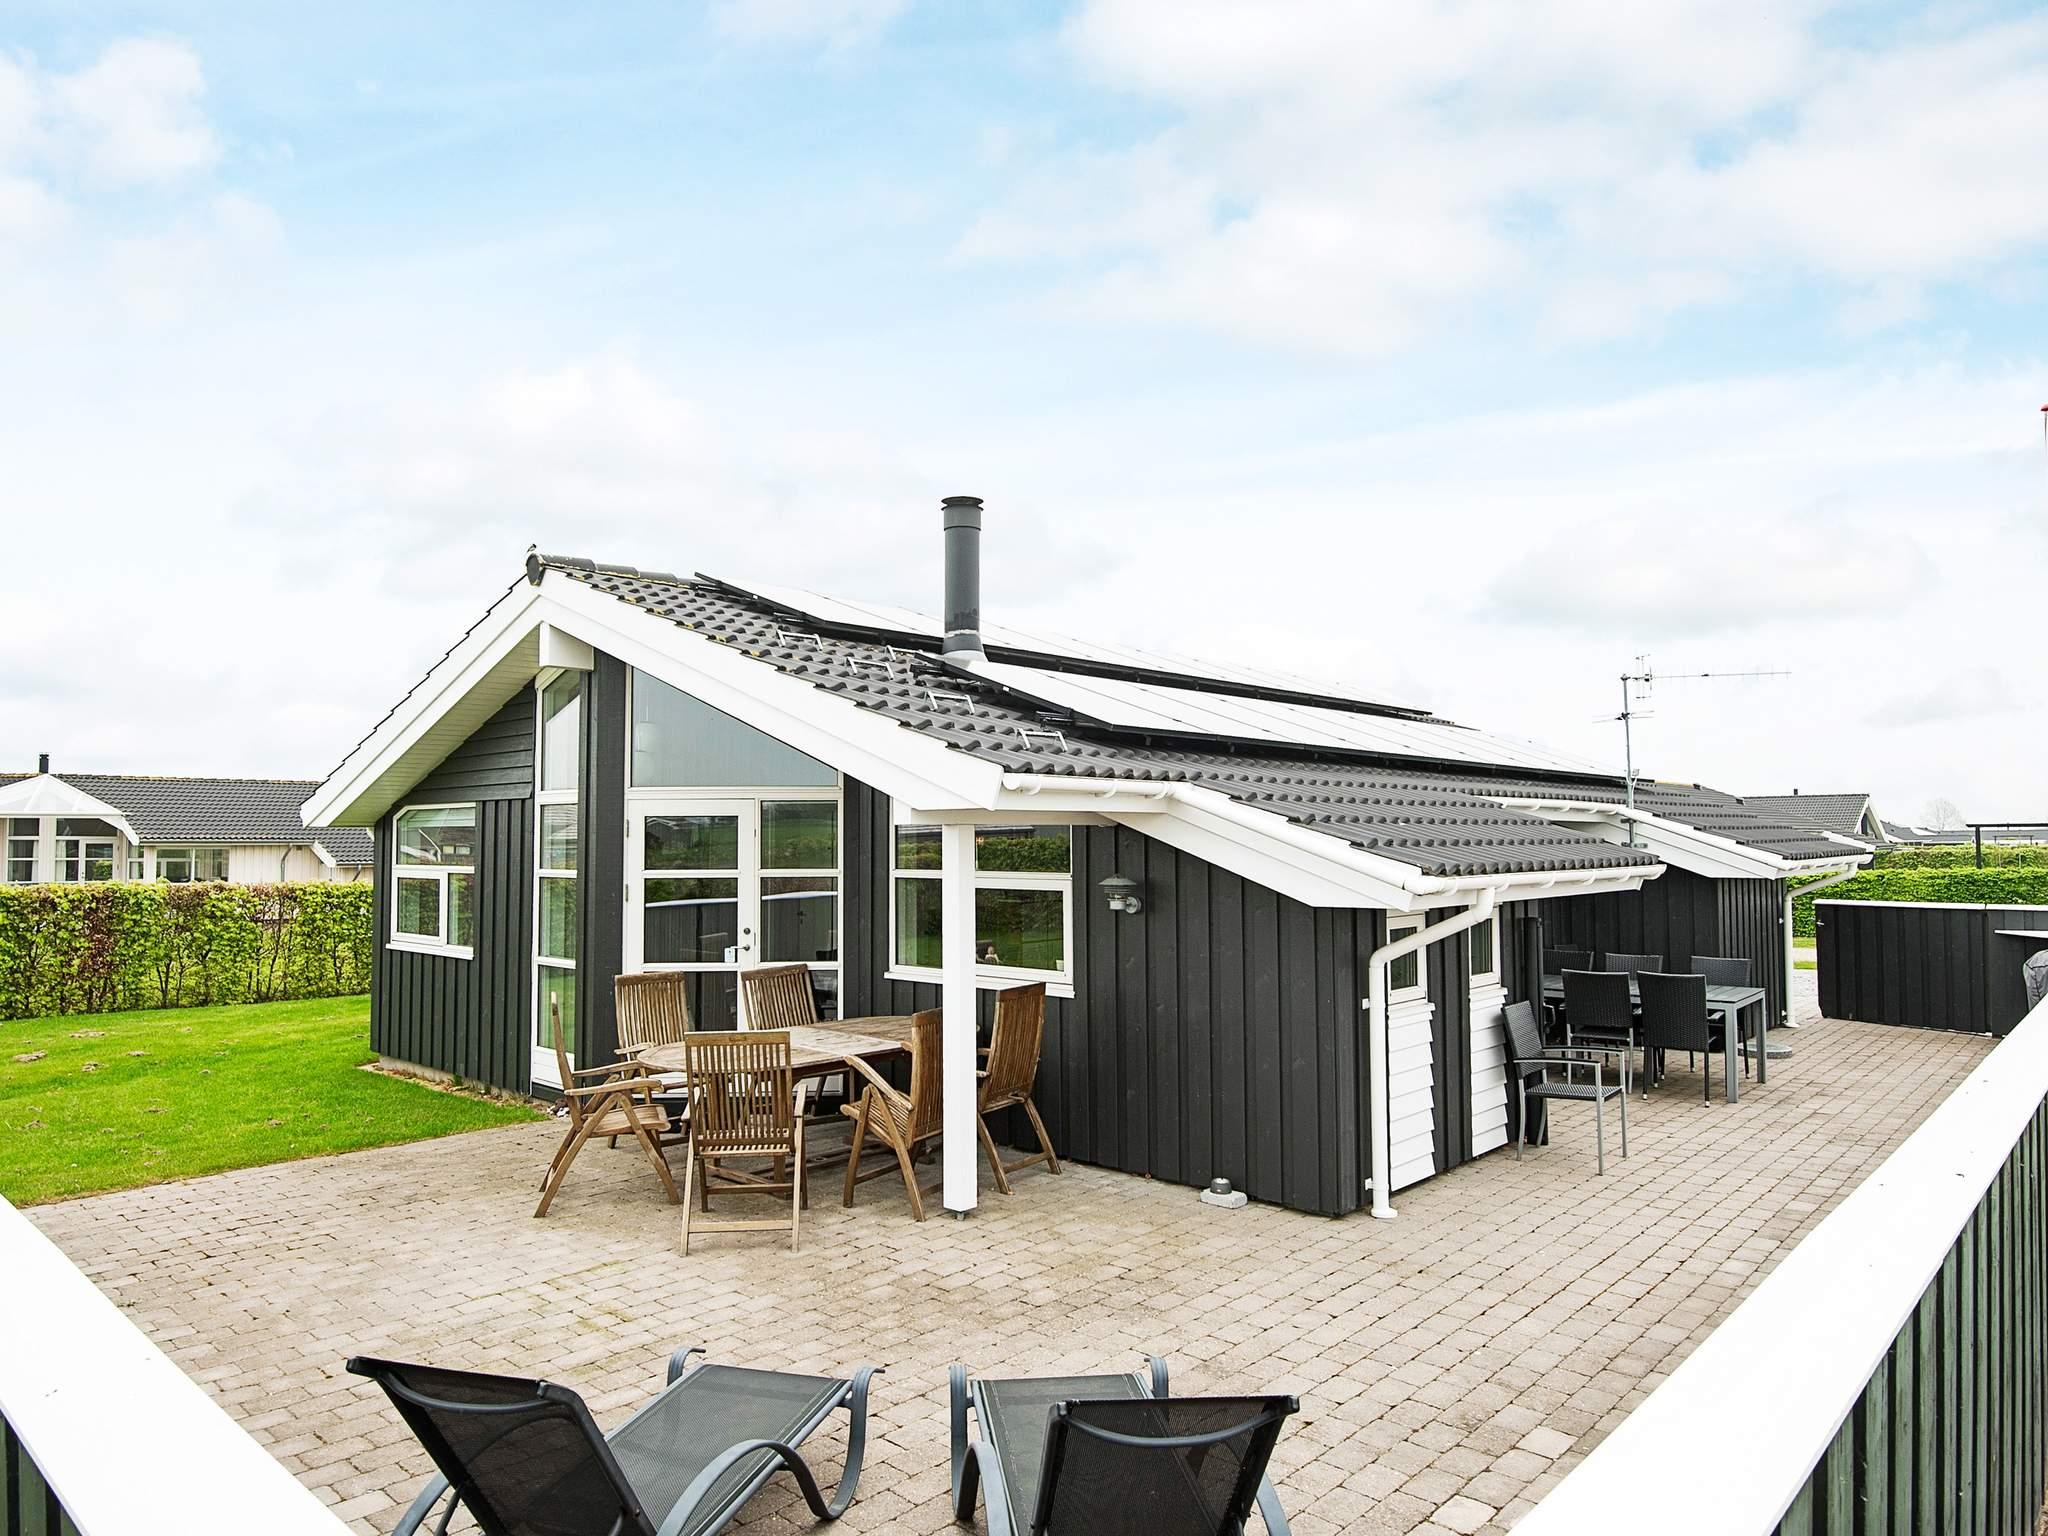 Ferienhaus Flovt Strand (379532), Flovt Strand, , Südostjütland, Dänemark, Bild 26